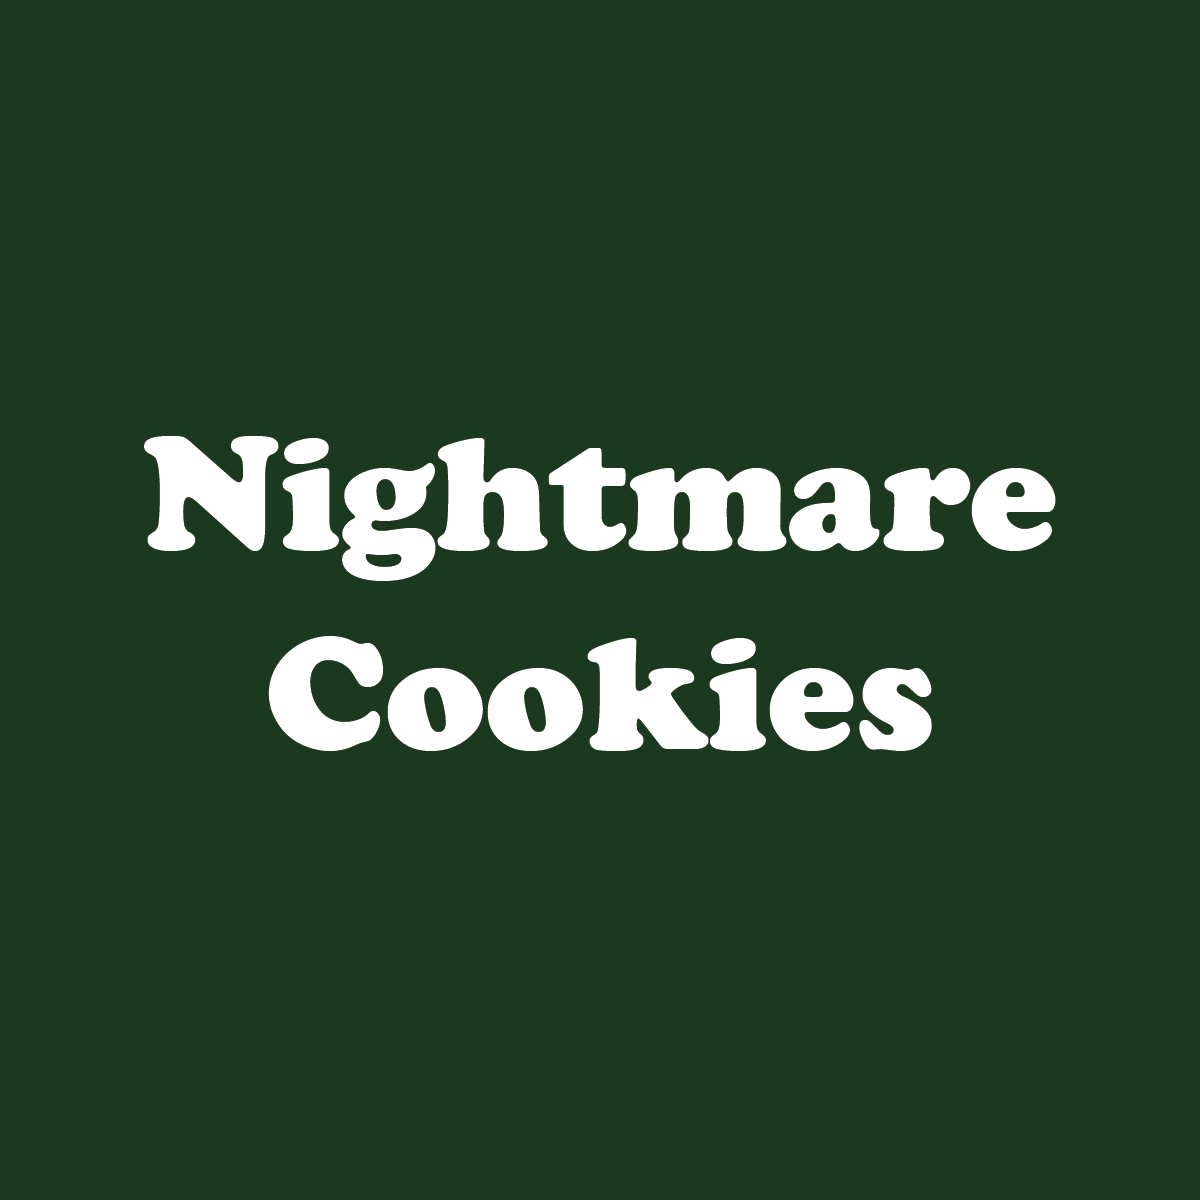 NightmareCookies.png